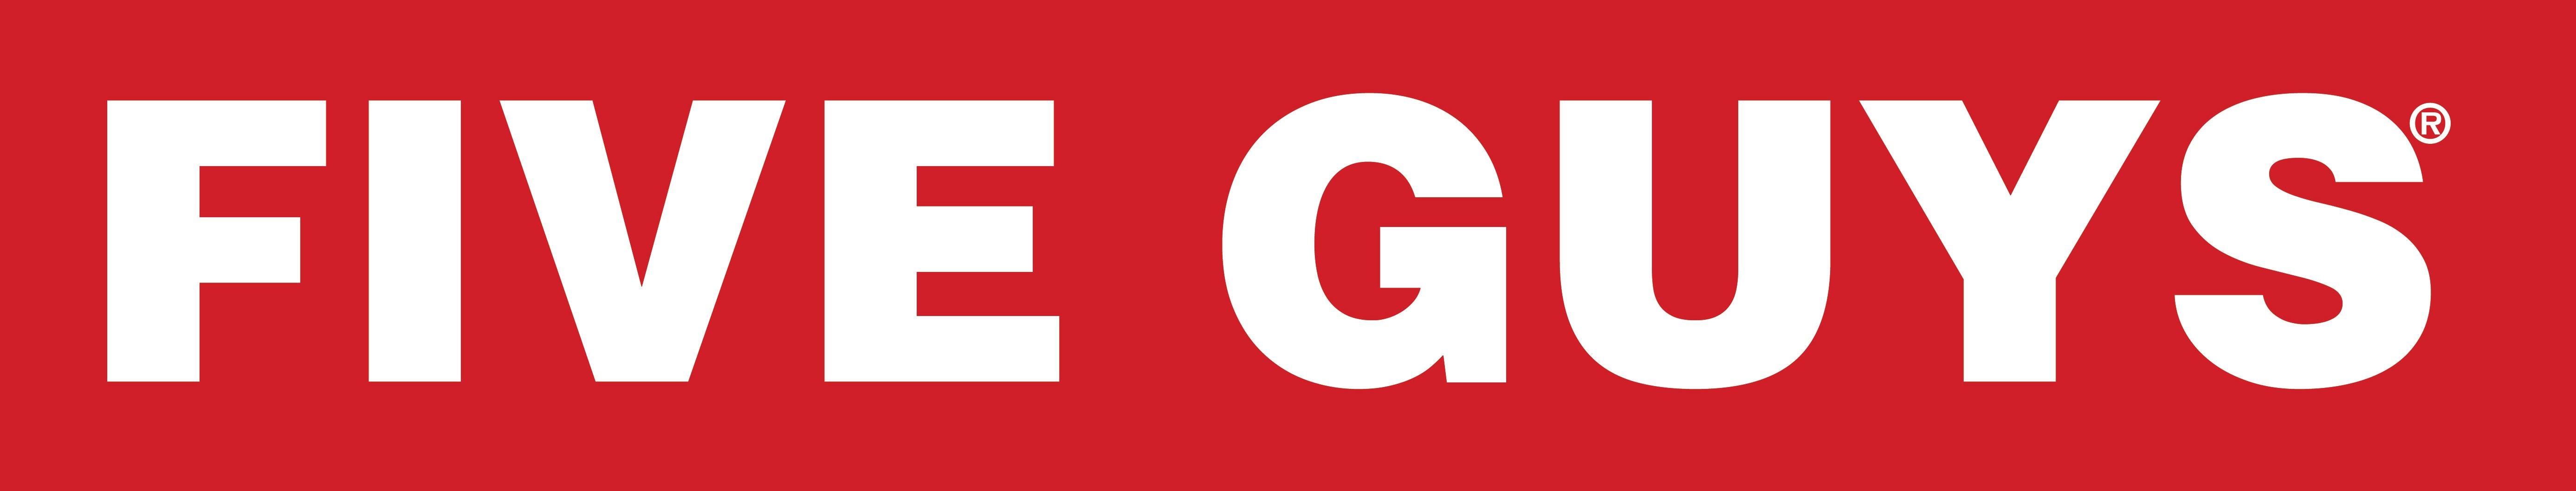 Logo White on Red-1